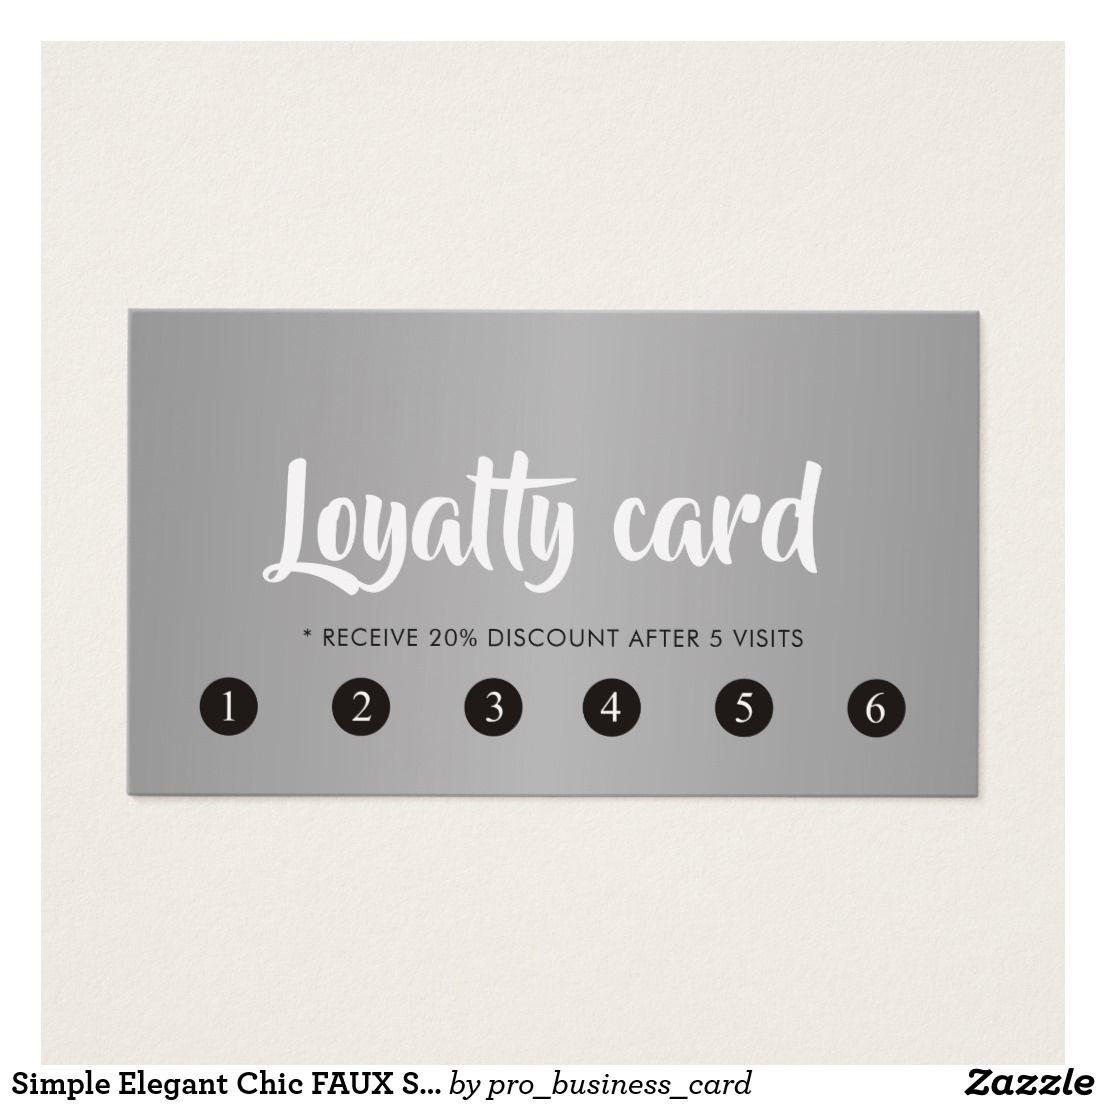 Simple Elegant Chic FAUX Silver Beauty Salon Loyalty Card  Zazzle